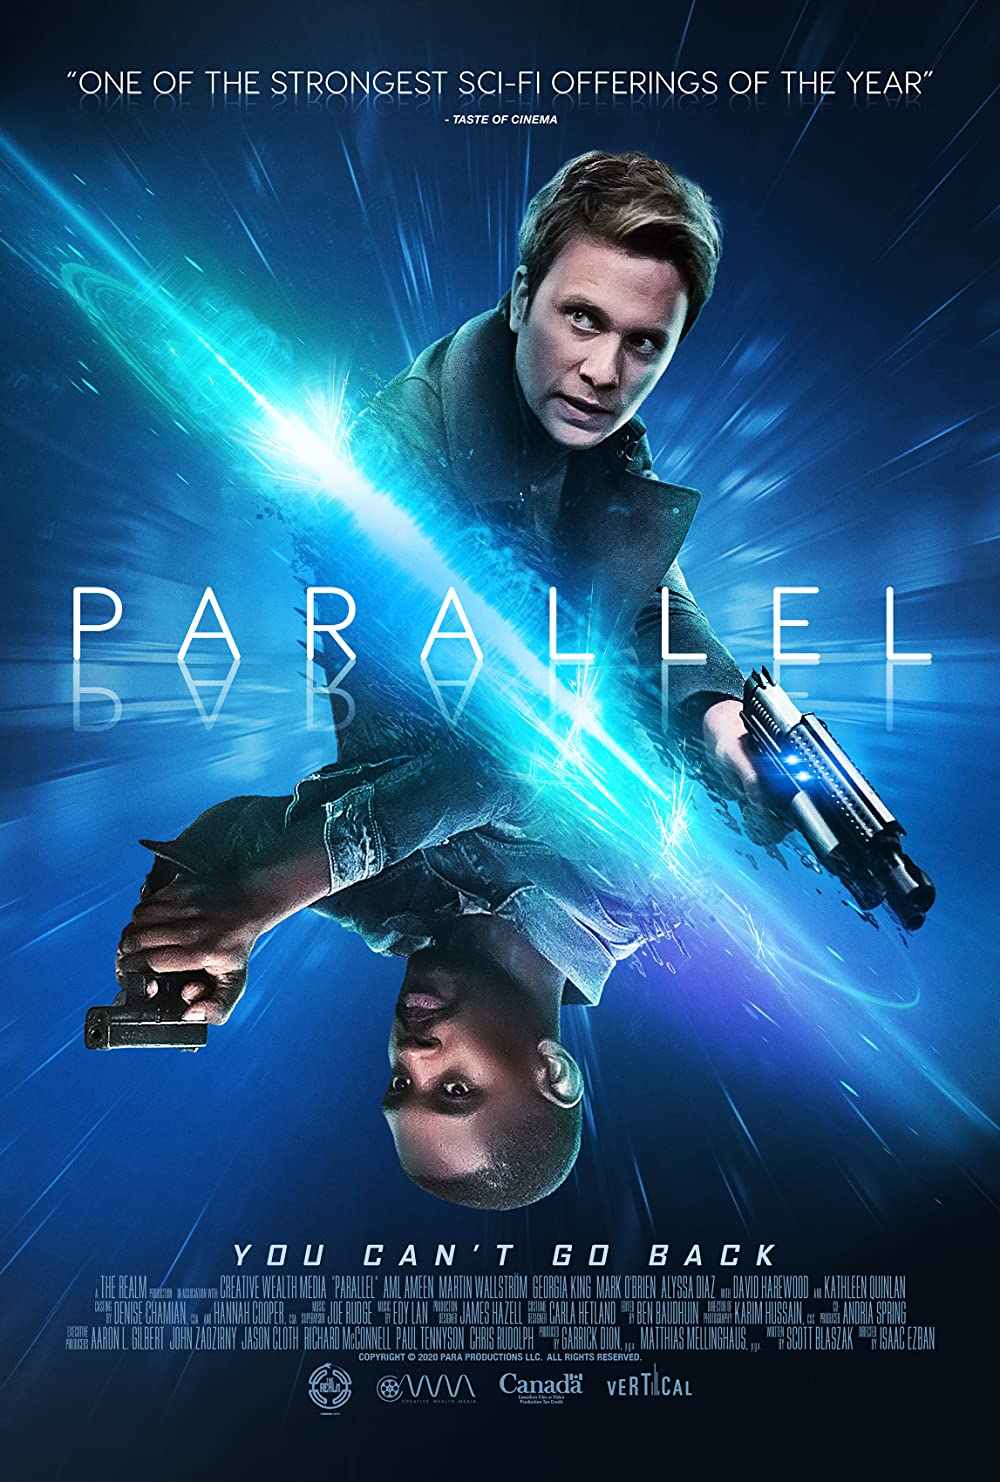 Parallel 2020 Dual Audio 720p HDRip [Hindi – English] Download